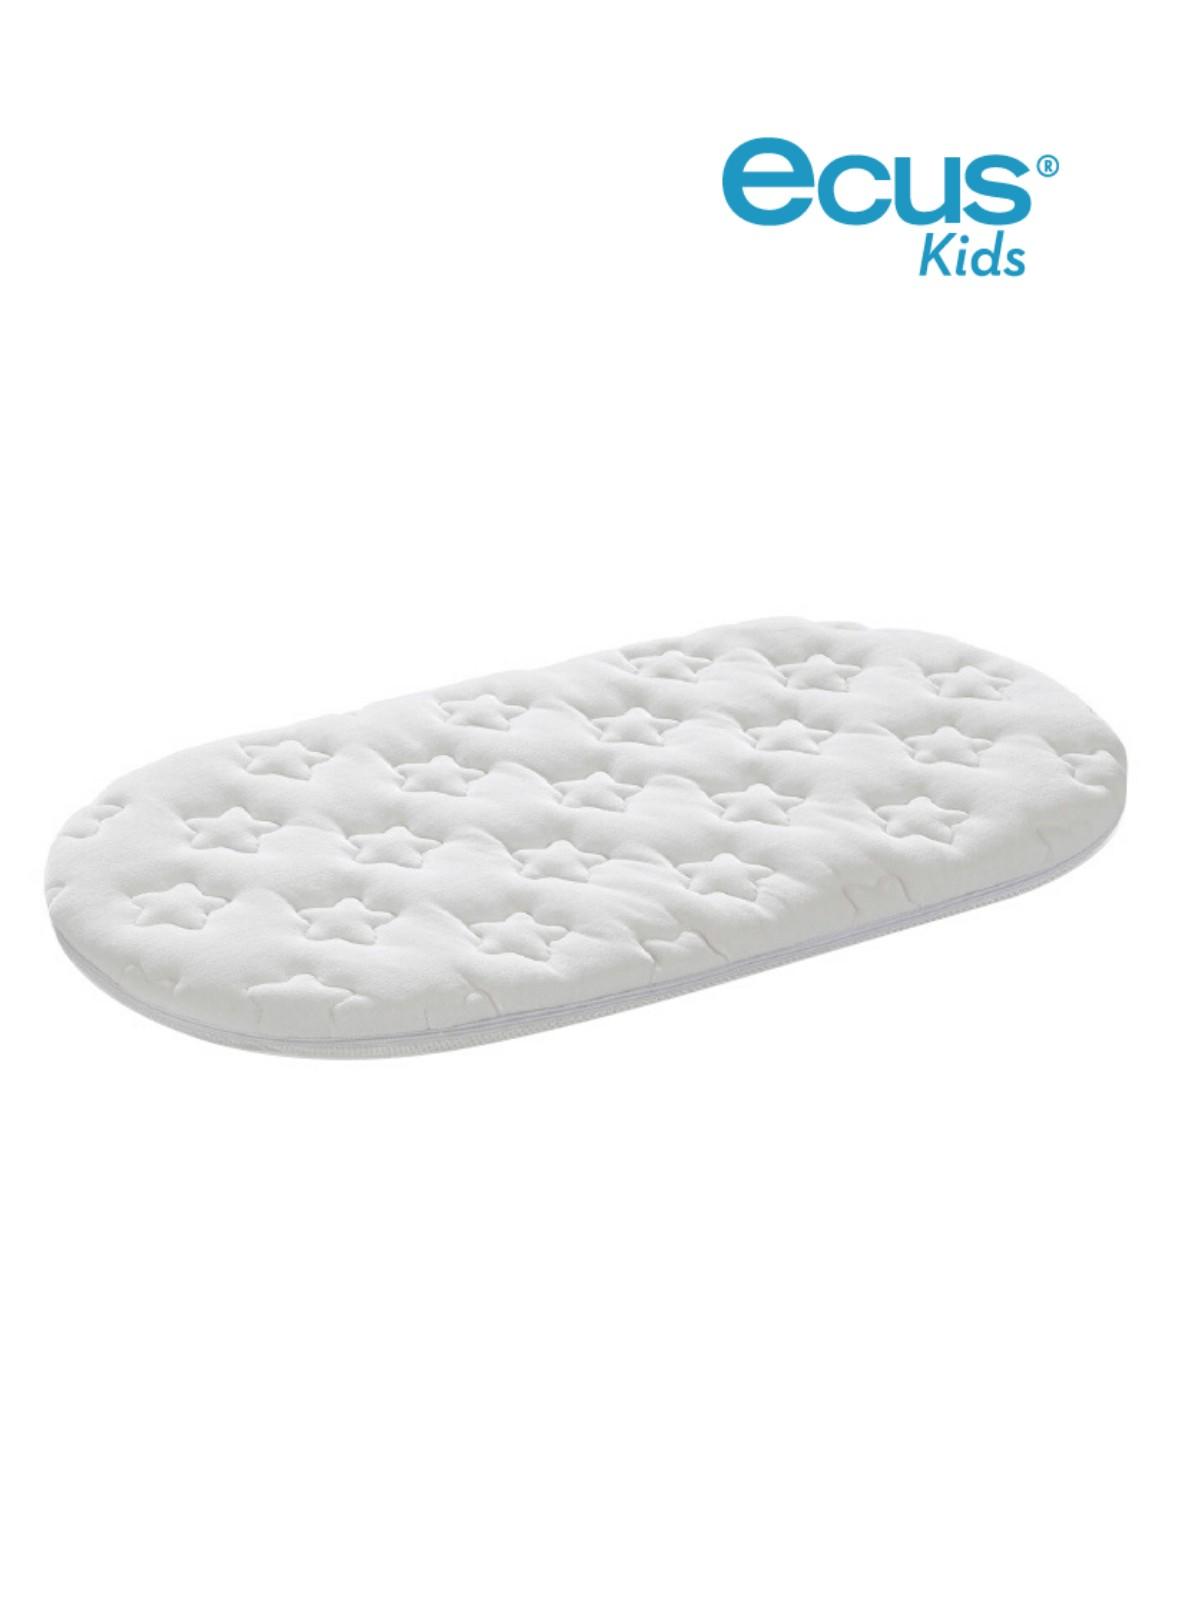 Colch/ón minicuna para capazo que evita alergias e irritaciones Ecus Kids Peti 72x33x6